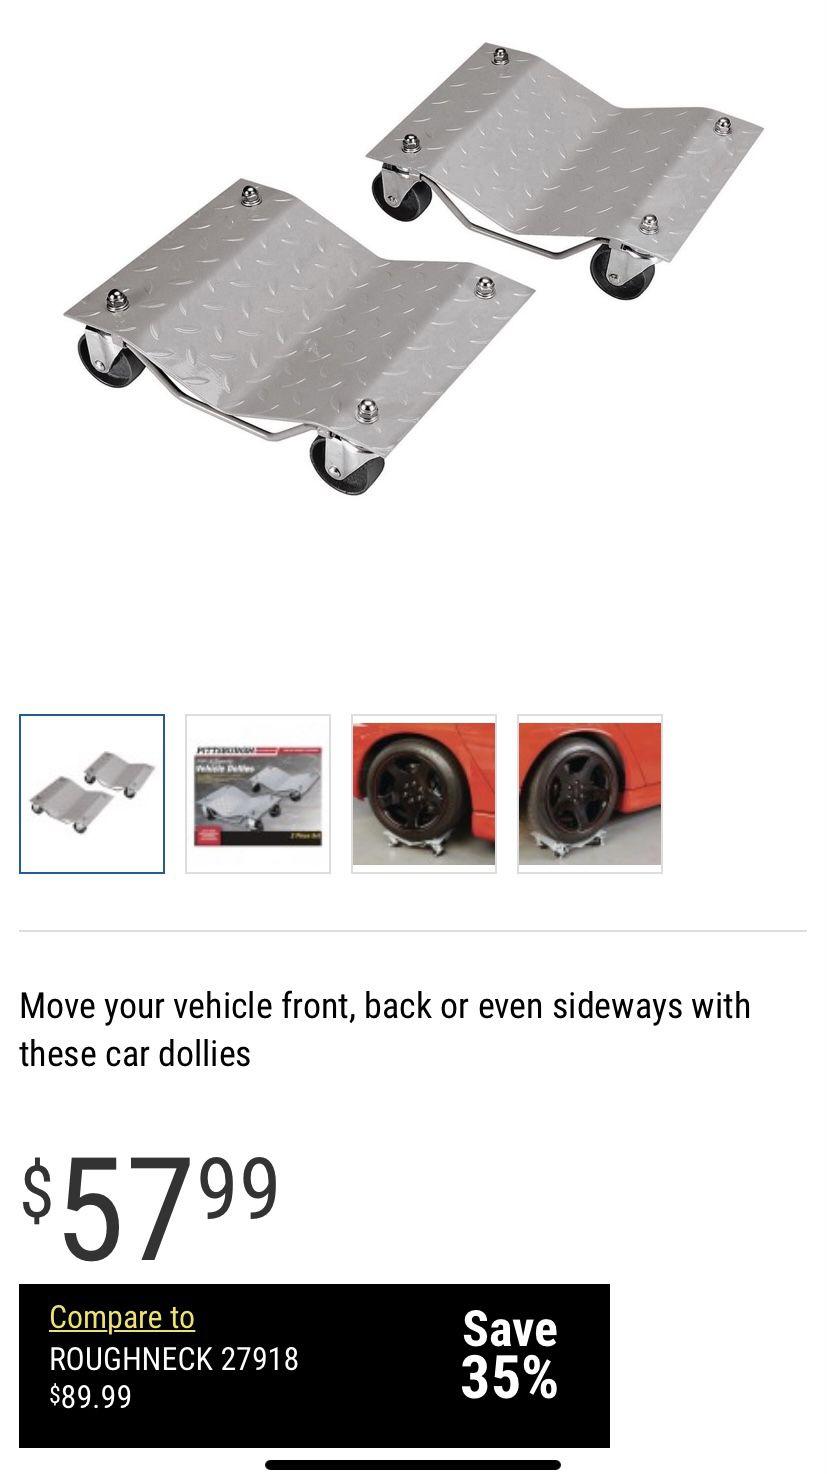 Car Dollies 1500# Per Dolly